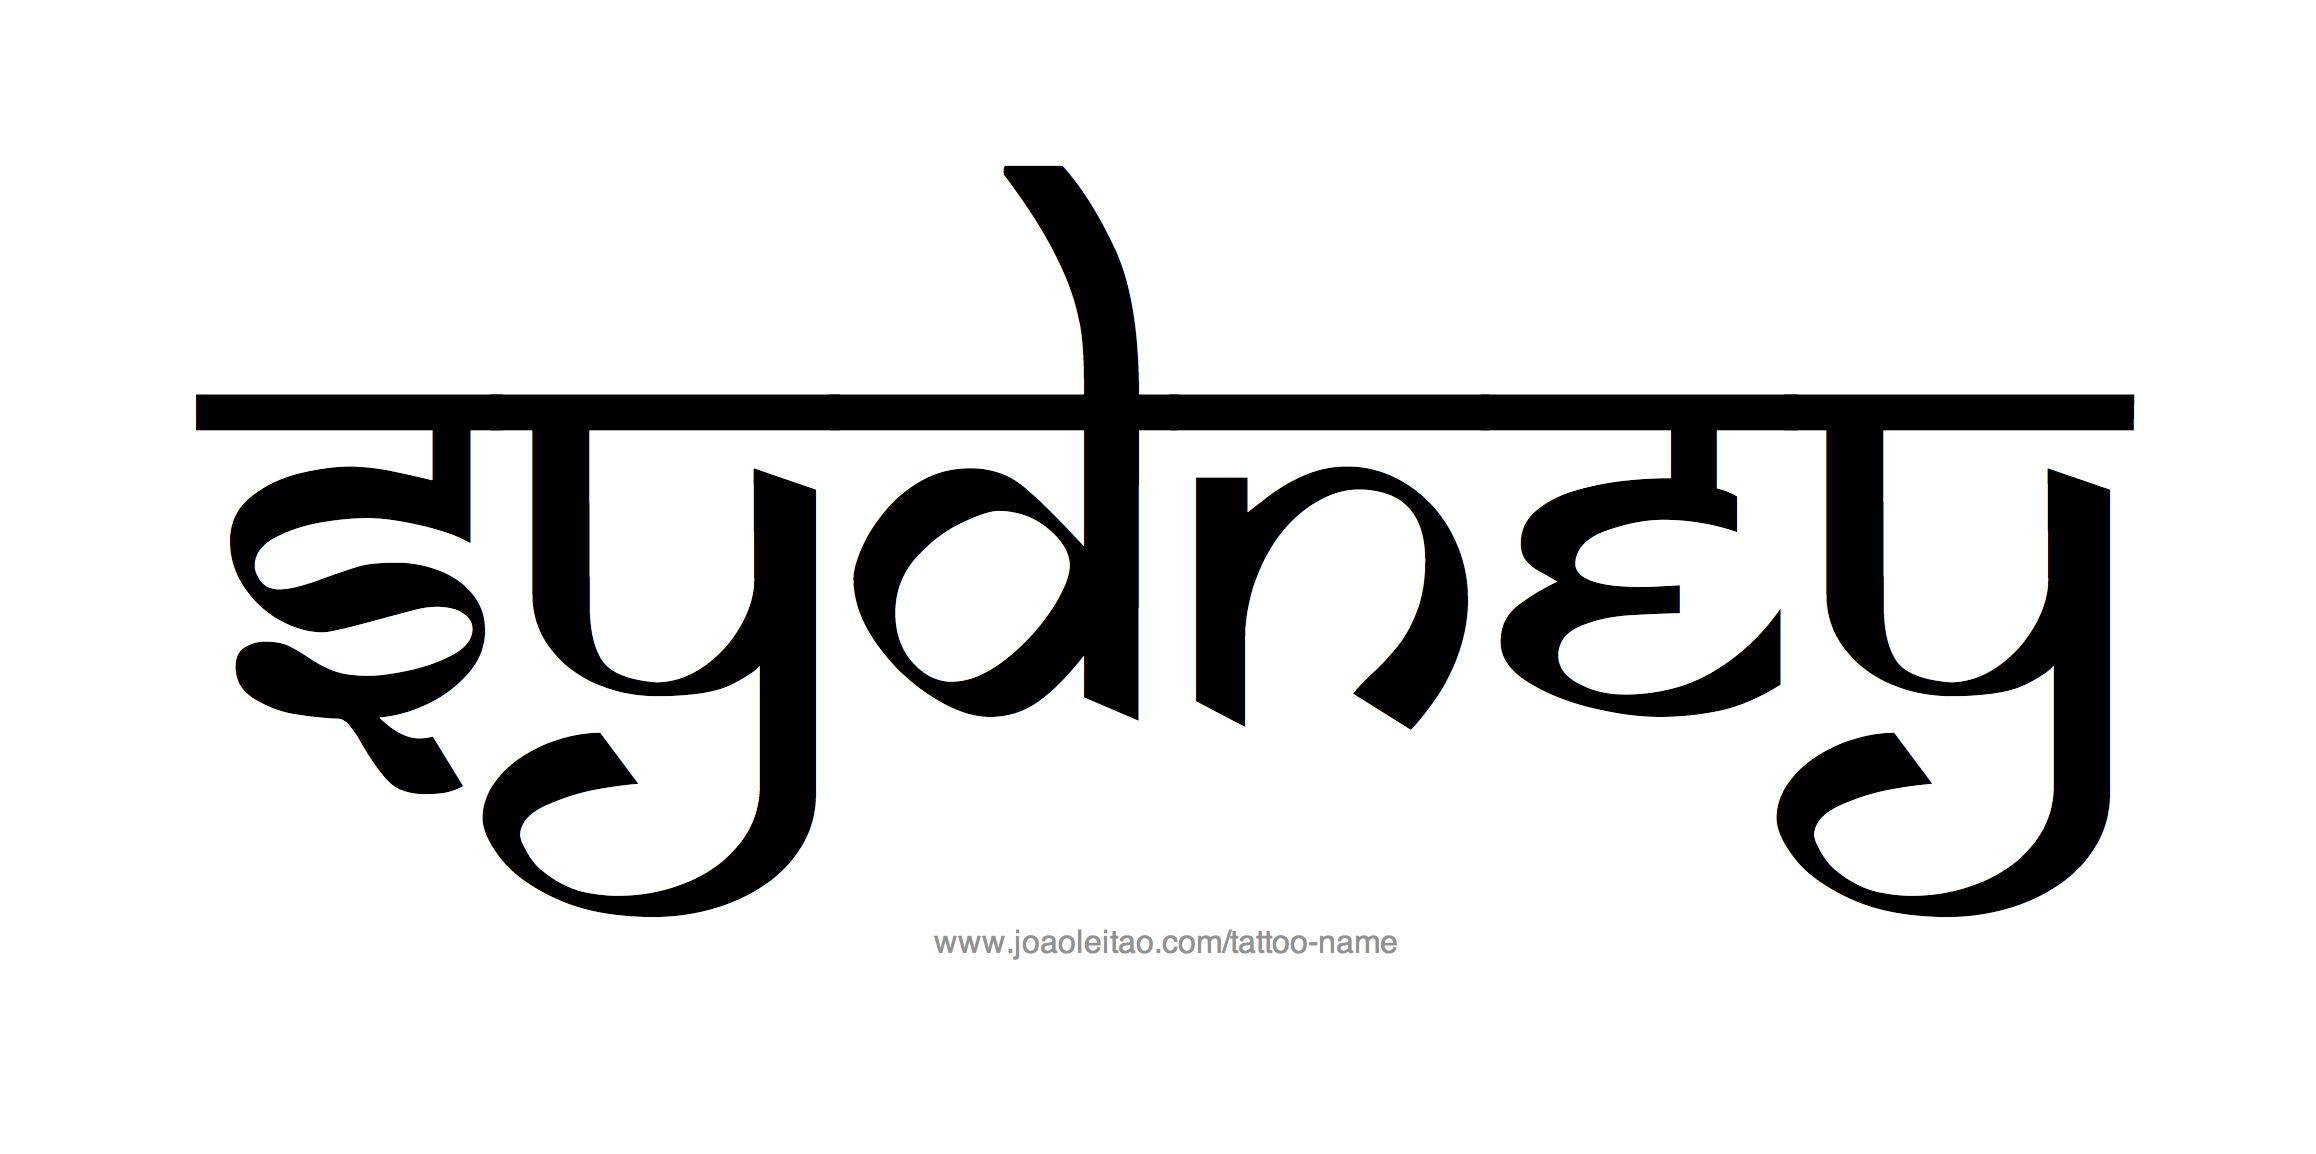 Name: Sydney Name Tattoo Designs